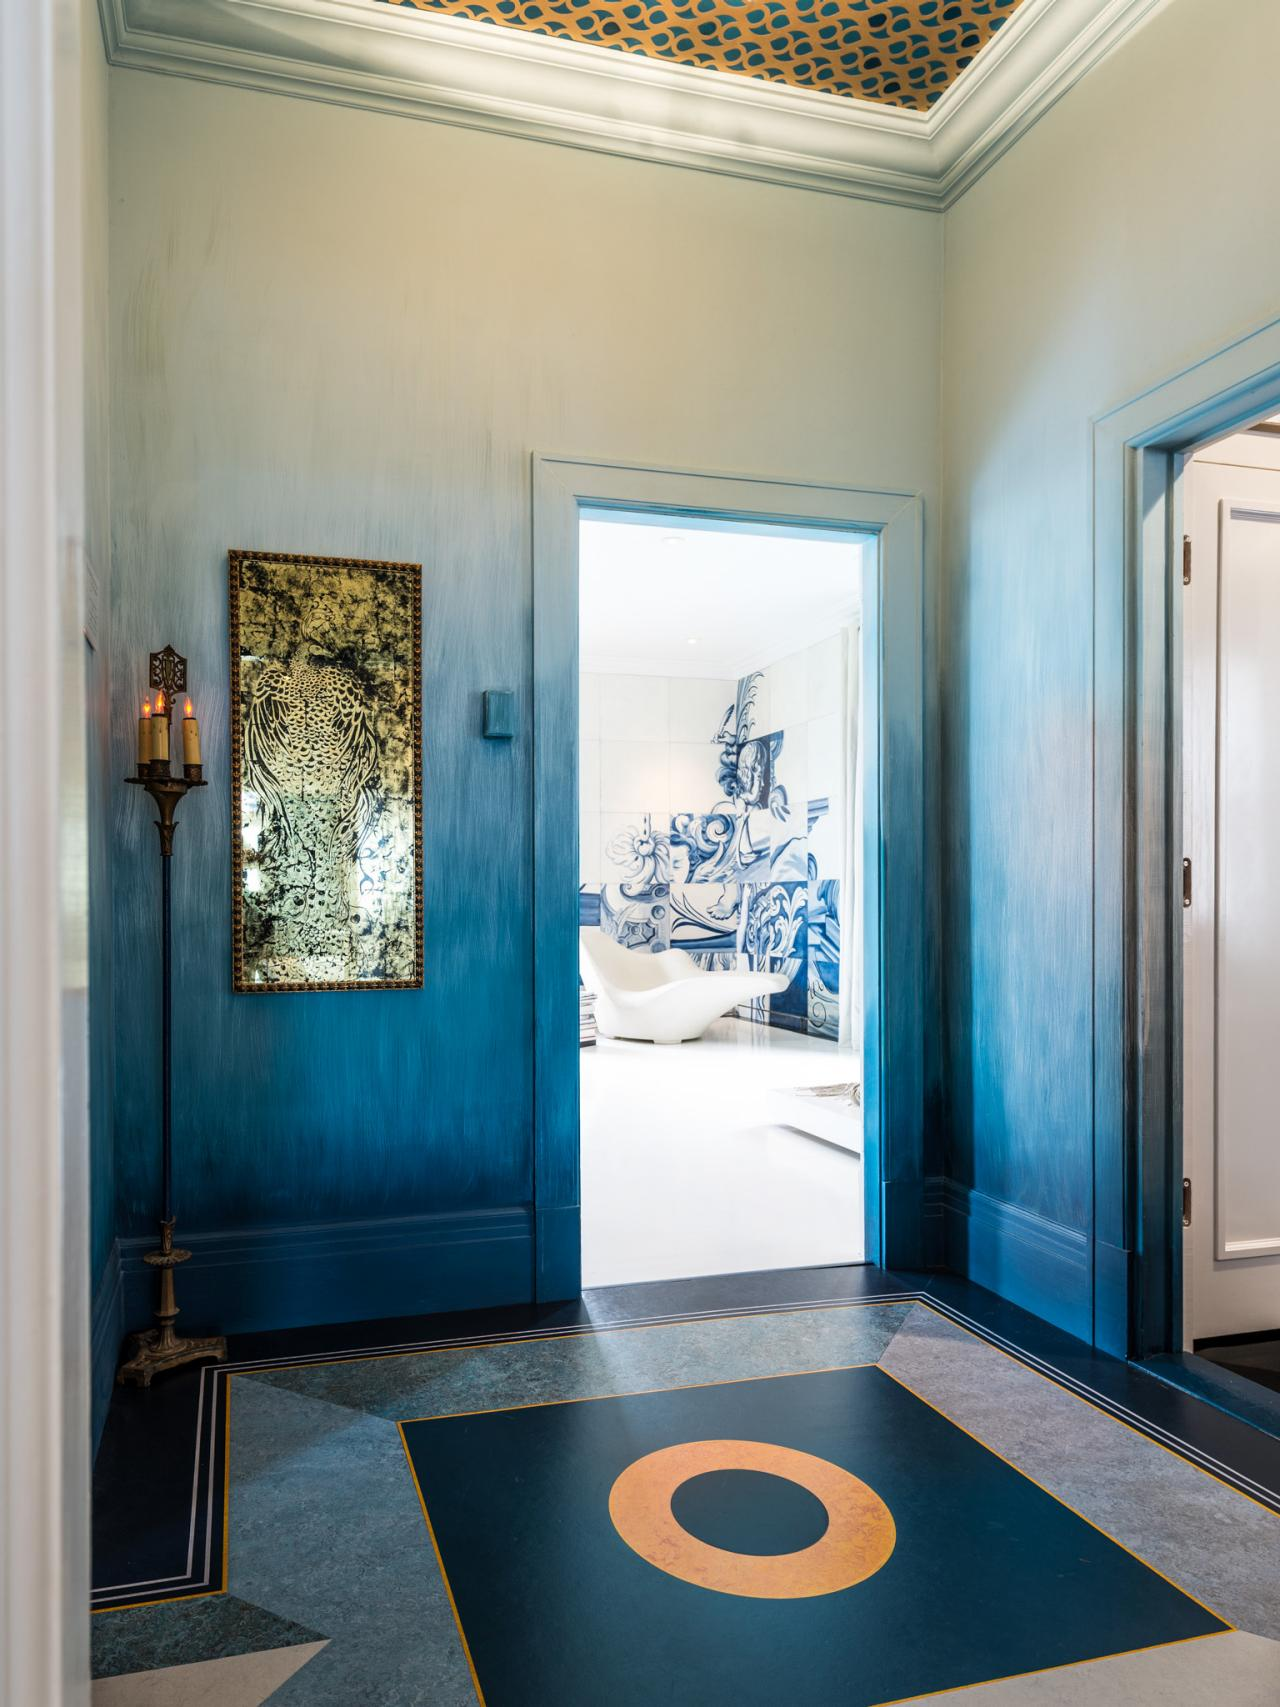 sf-decorator-showcase-14-modern-romantics-lair-and-vestibule-bedroom-entrance_v-jpg-rend-hgtvcom-1280-1707